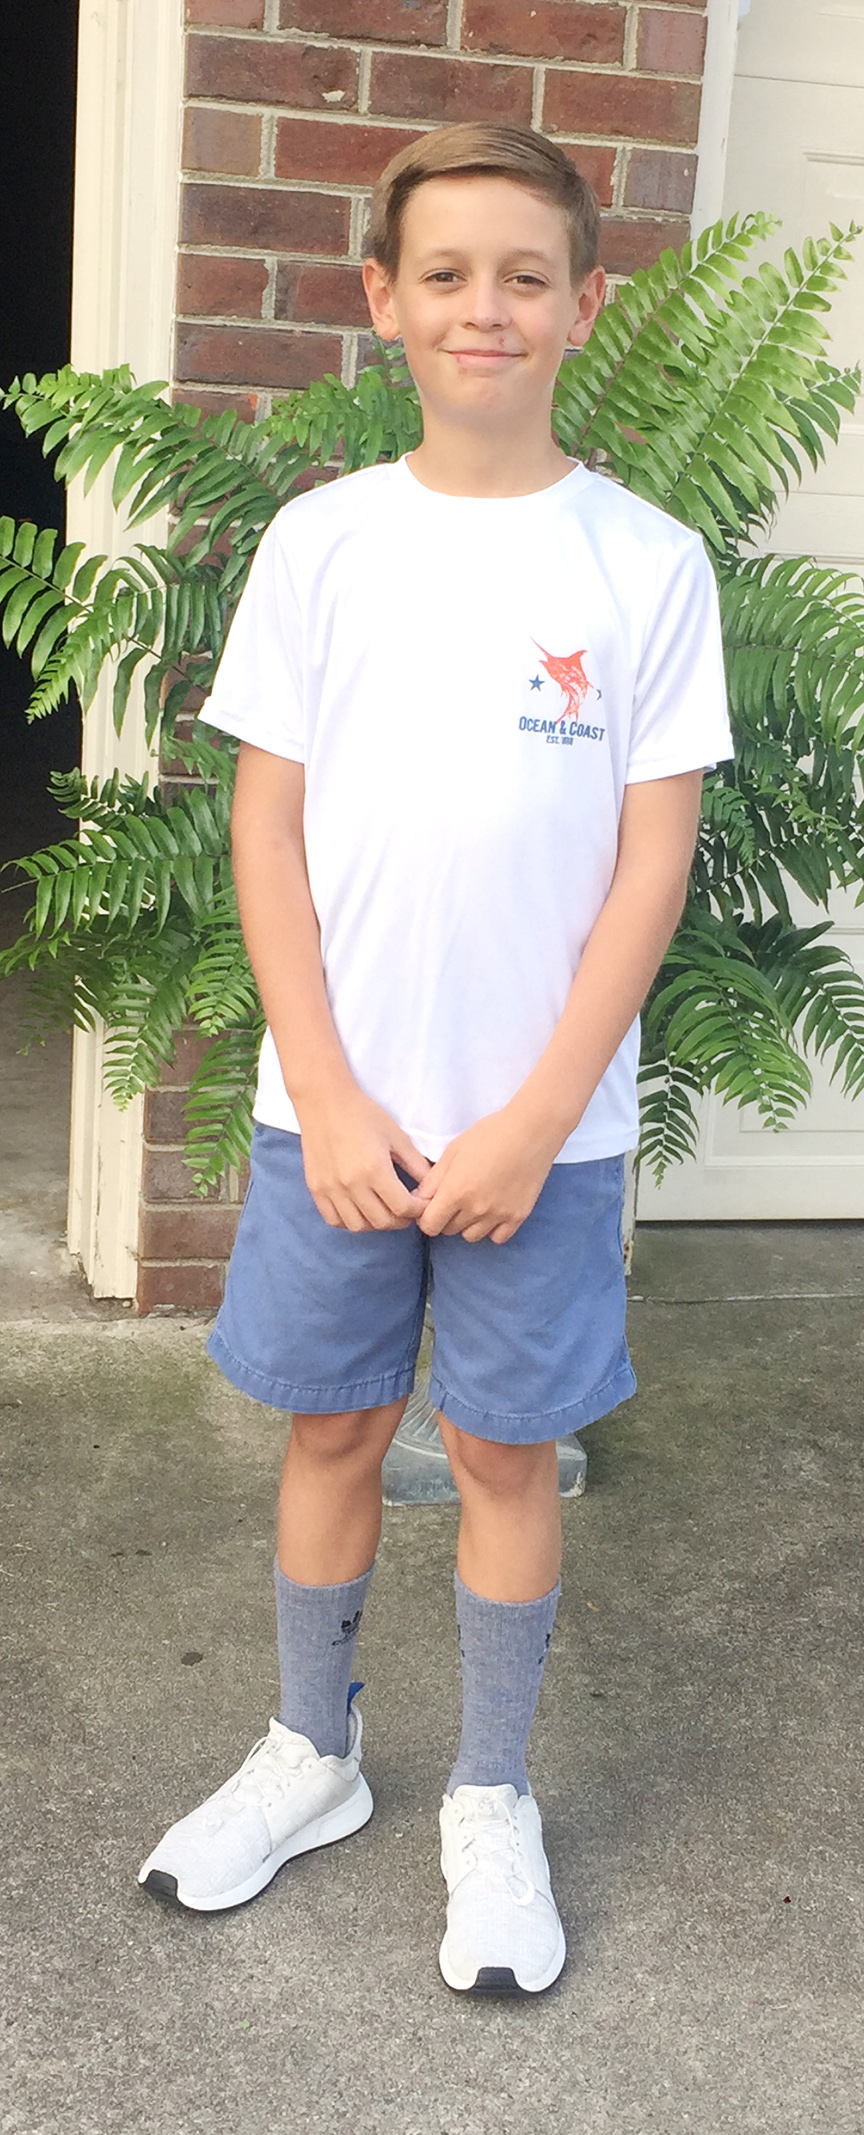 Corbin Jackson, seventh grade, Contentnea-Savannah K-8 School